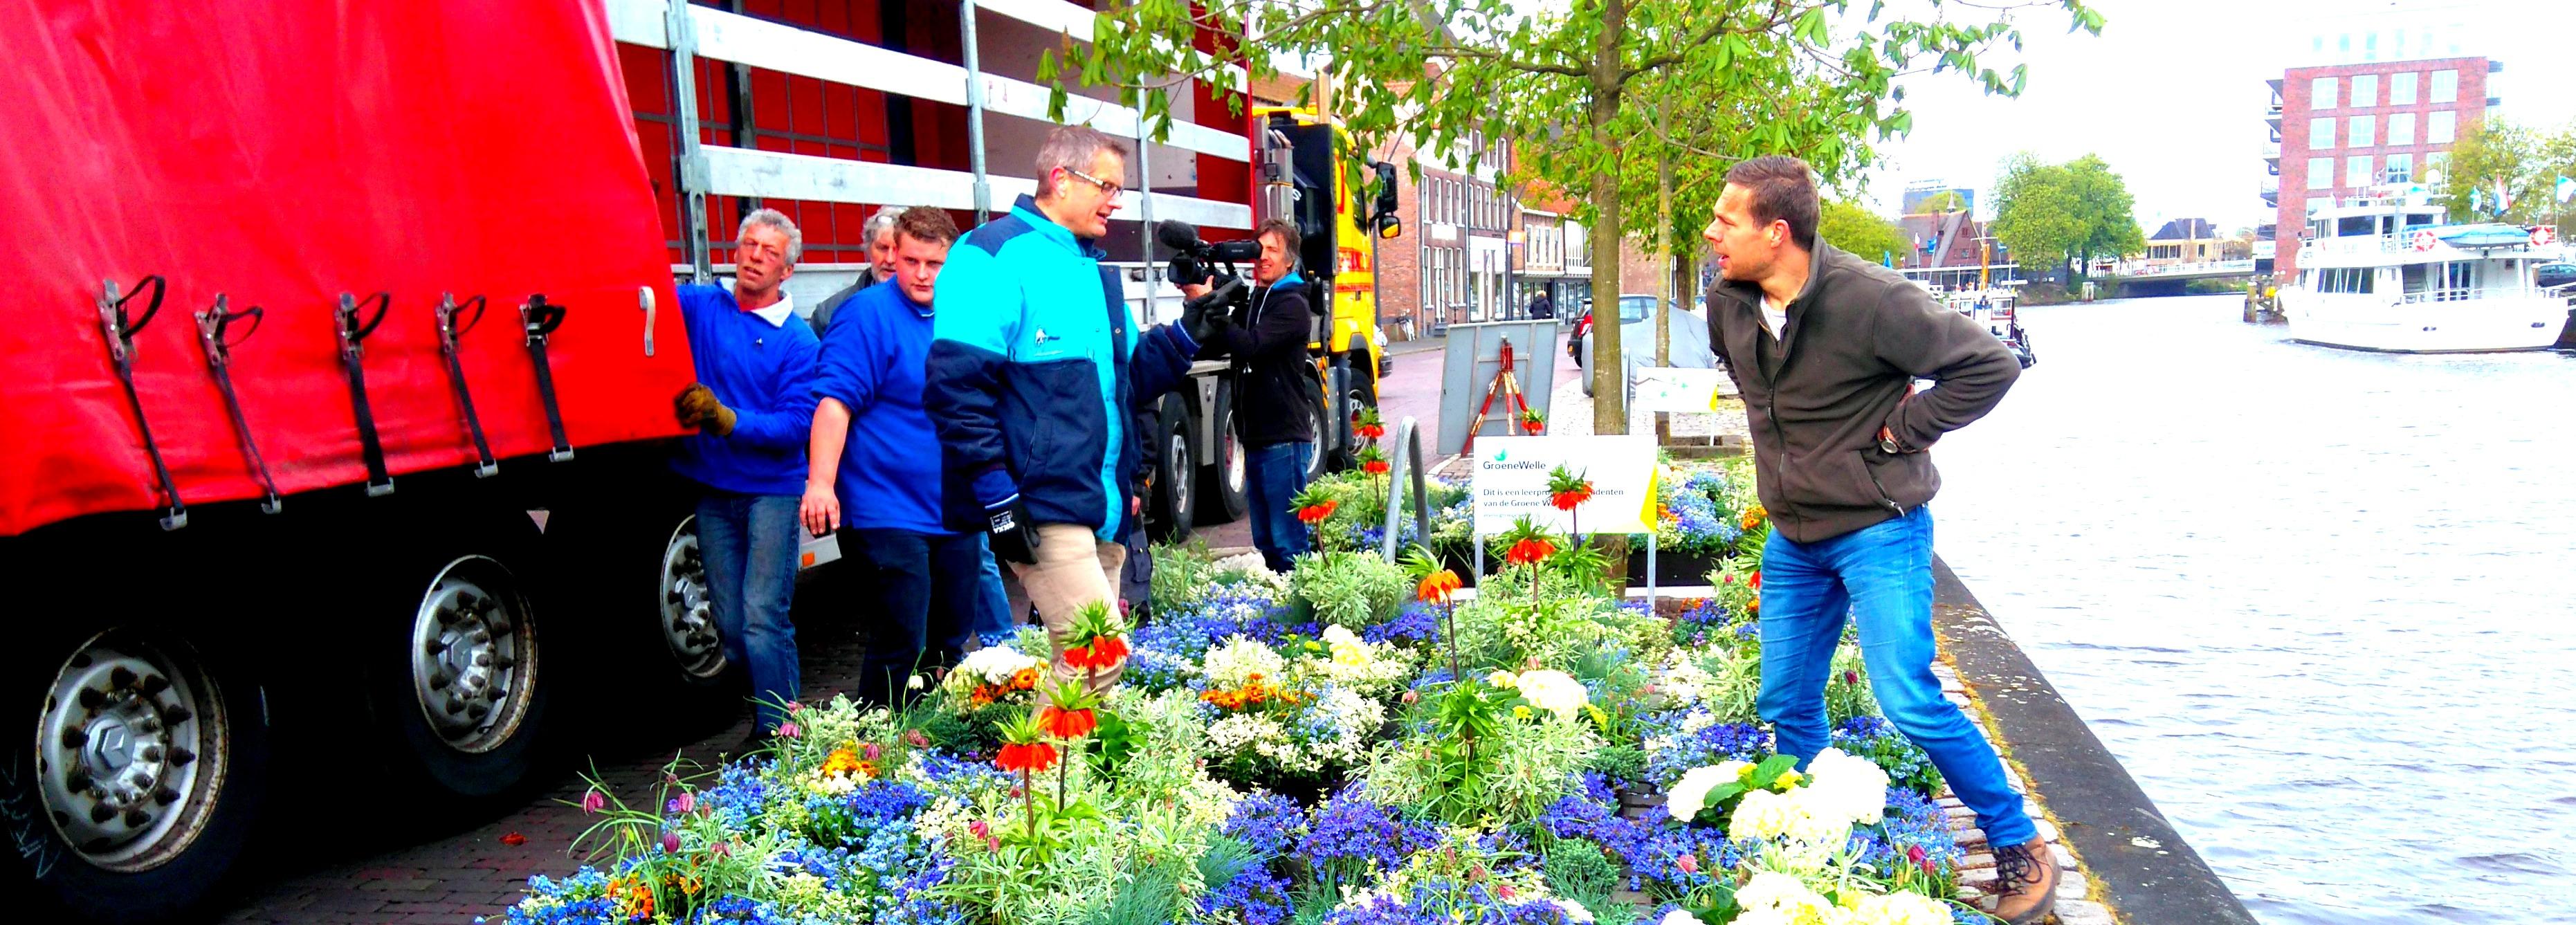 Harry Pierik – Drijvende bloembedden in een Zwolse stadsgracht